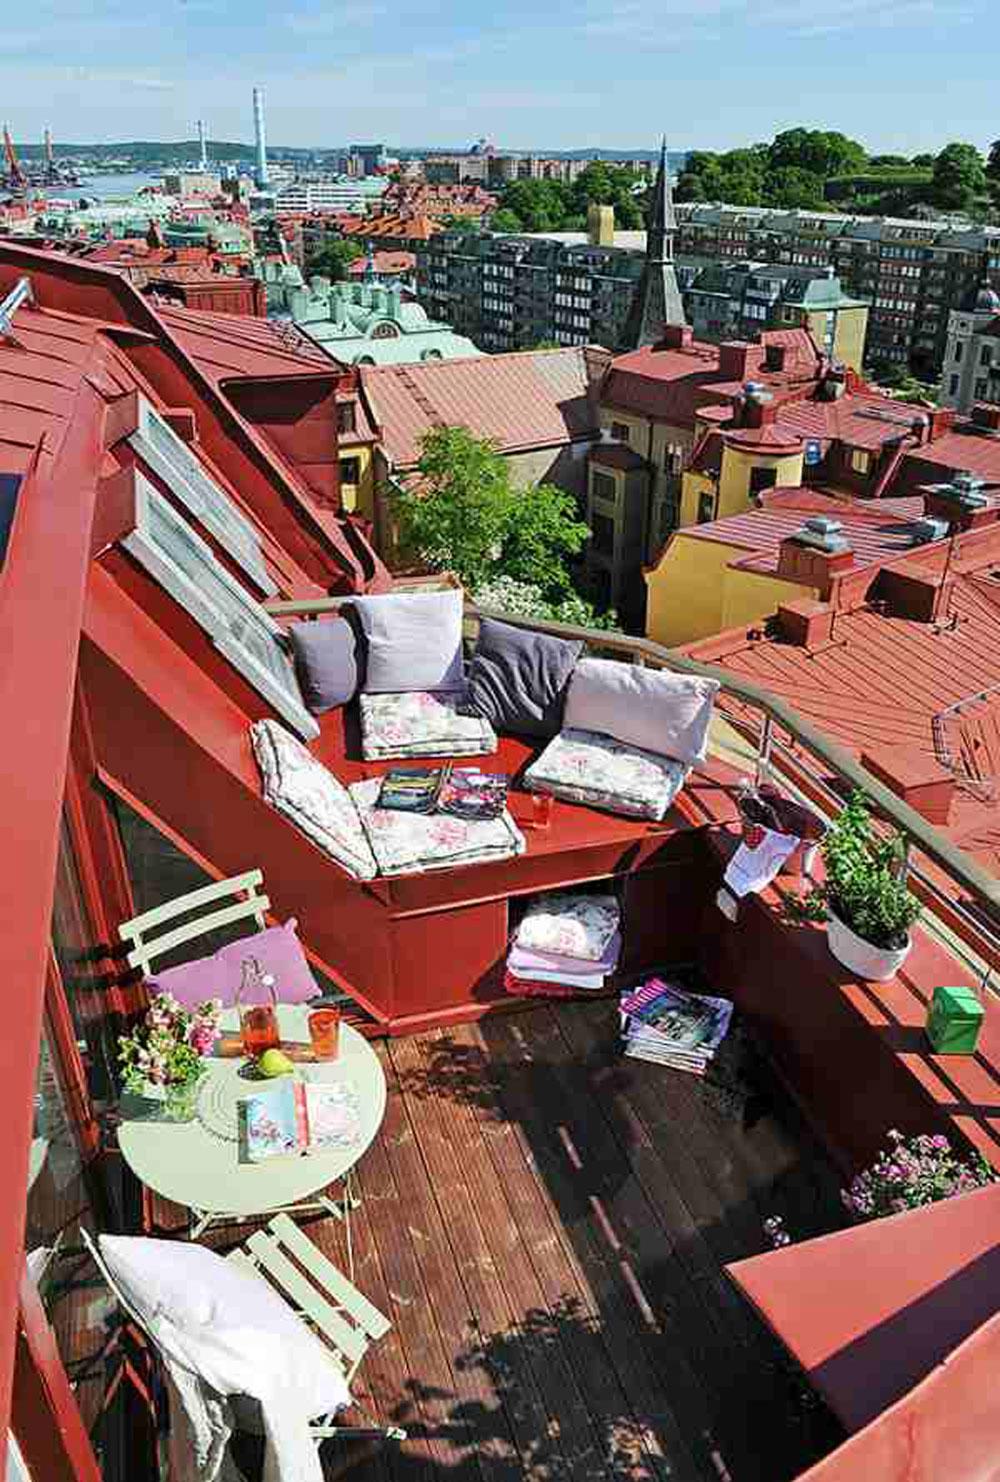 House-balcony-design-ideas-for-the-best-balcony-design-2 house-balcony-design-ideas for the best-balcony-design